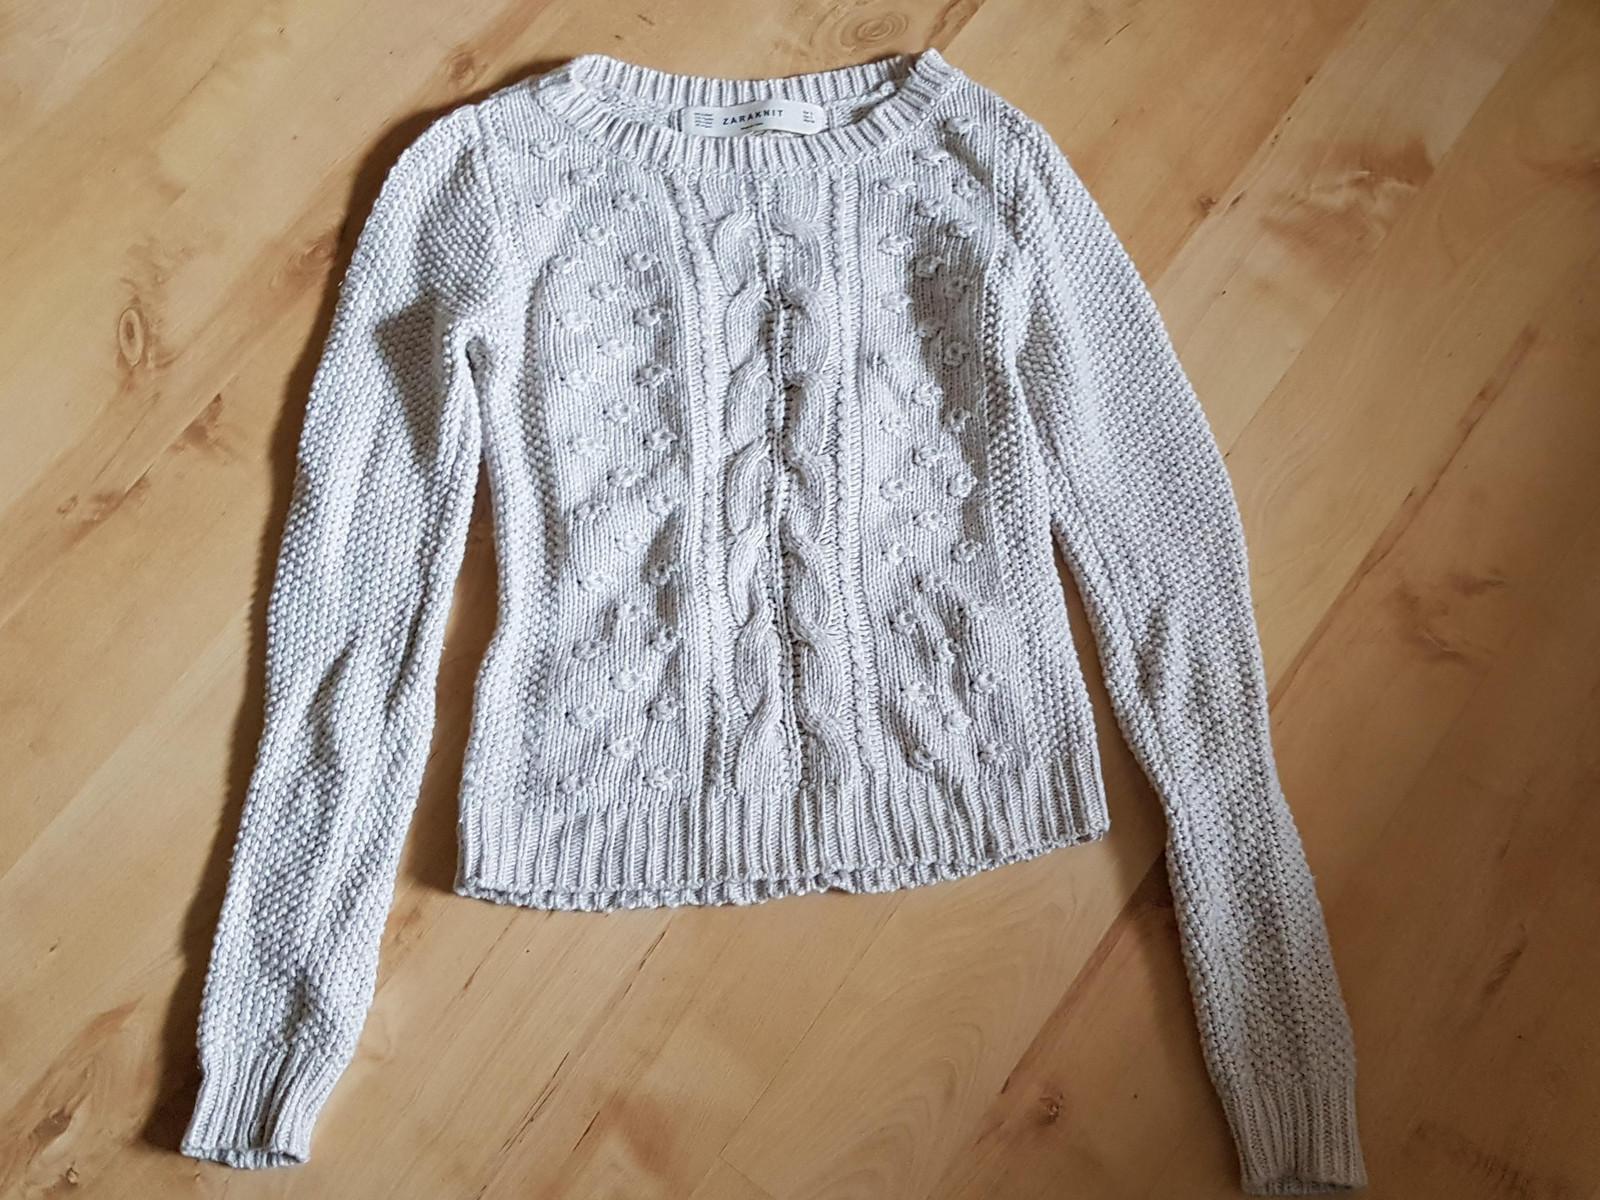 Zara perle genser str. S | FINN.no